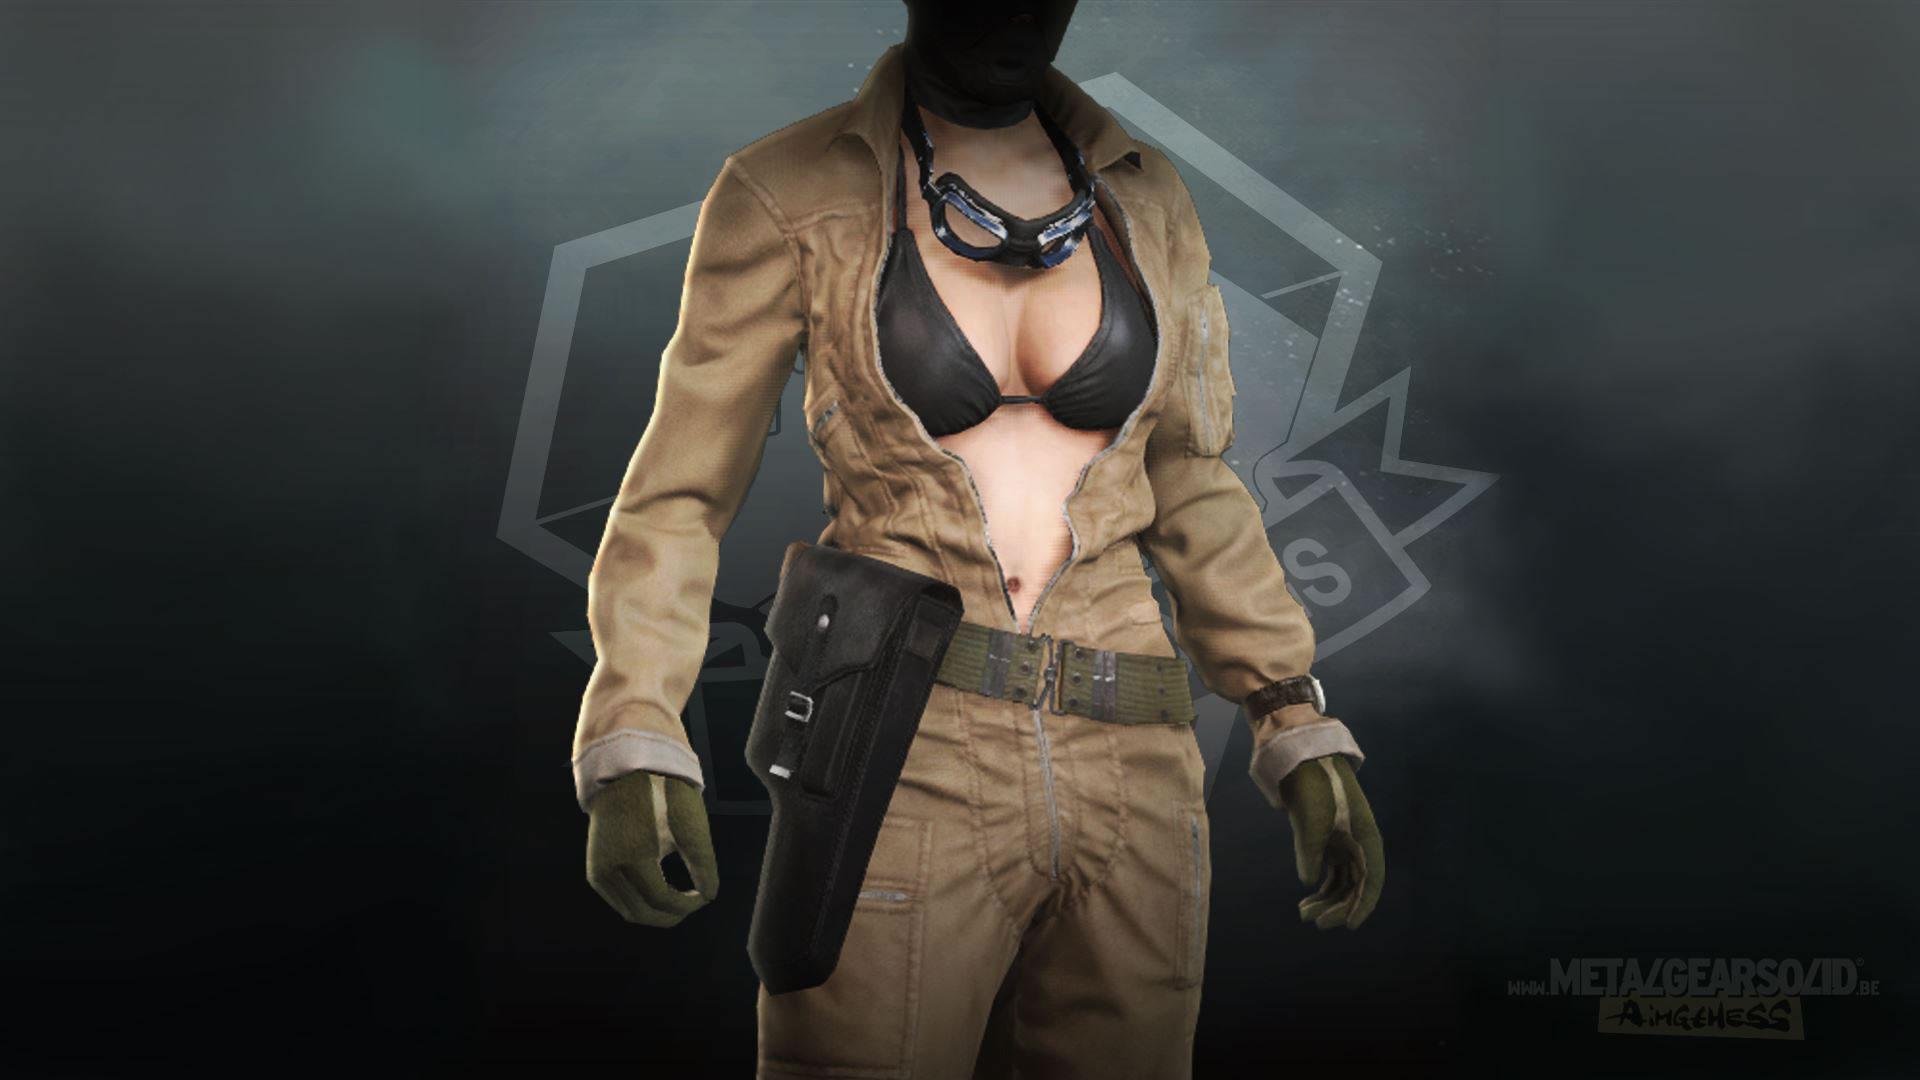 mgsv-tpp-costumes-dlc-combinaison-eva-01